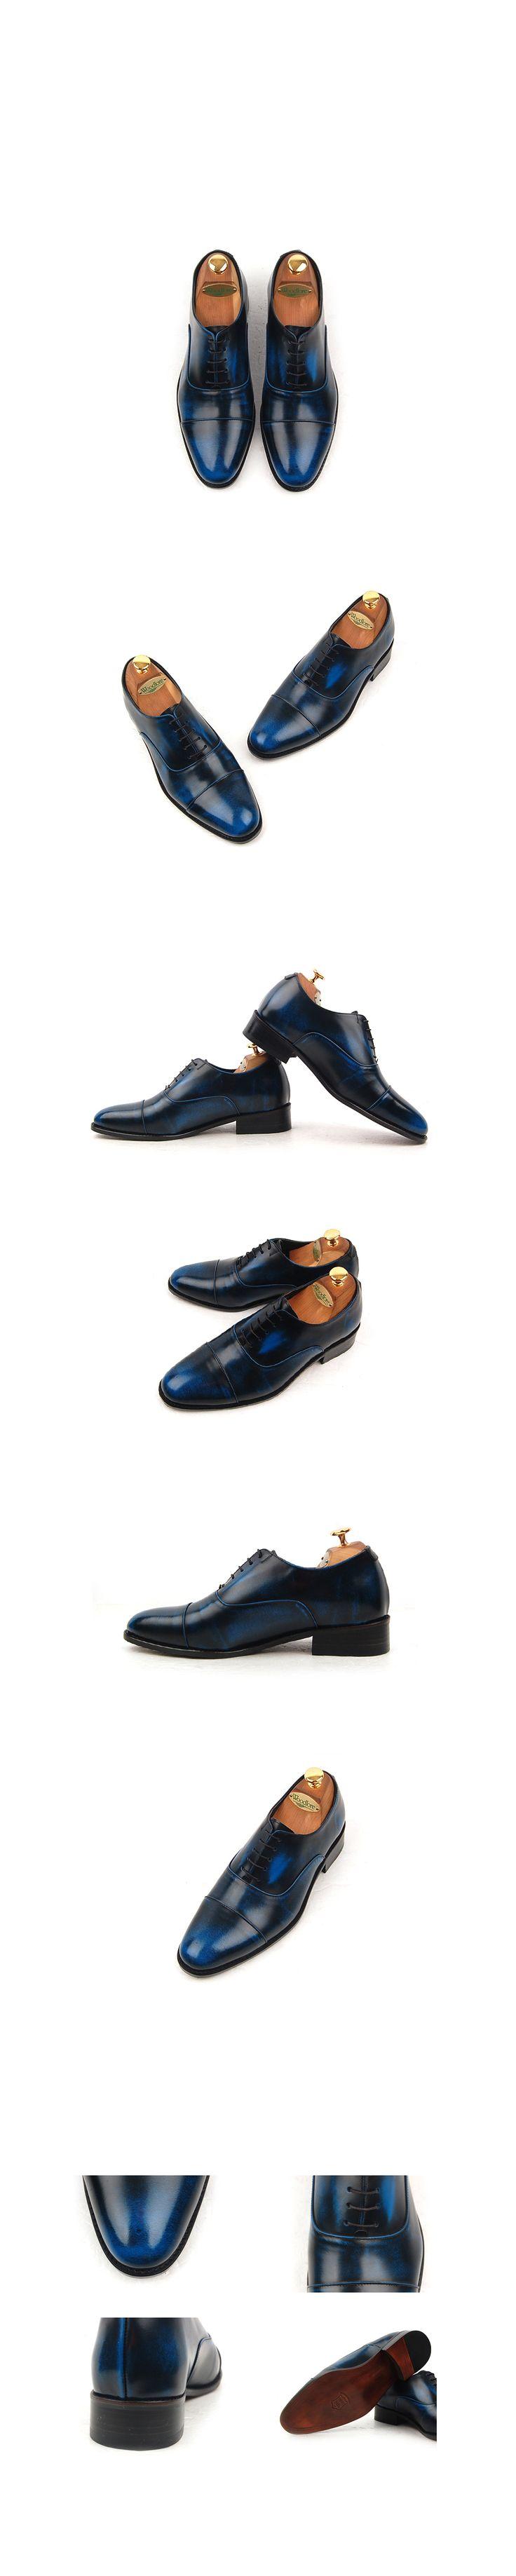 H3THECLASSIC loafer shoes man fashion #h3theclassicl#handmadeshoes#shoes#madeinkorea#instashoes#classic#menshoes#oxford#h3theclassic#fashion#custom#handmade#mensshoes#instashoe#손신발#에이치쓰리더클래식#수제화#남성수제화#남자수제화#커스텀#남자구두#핸드메이드#신스타그램#맞춤#클리퍼#남성클리퍼#남자로퍼#맞춤클리퍼#fashionaddict#dailystyle#instafashion#ootd#ootdmagazine#lookbook#streetchic#데일리룩#OX-1001BU